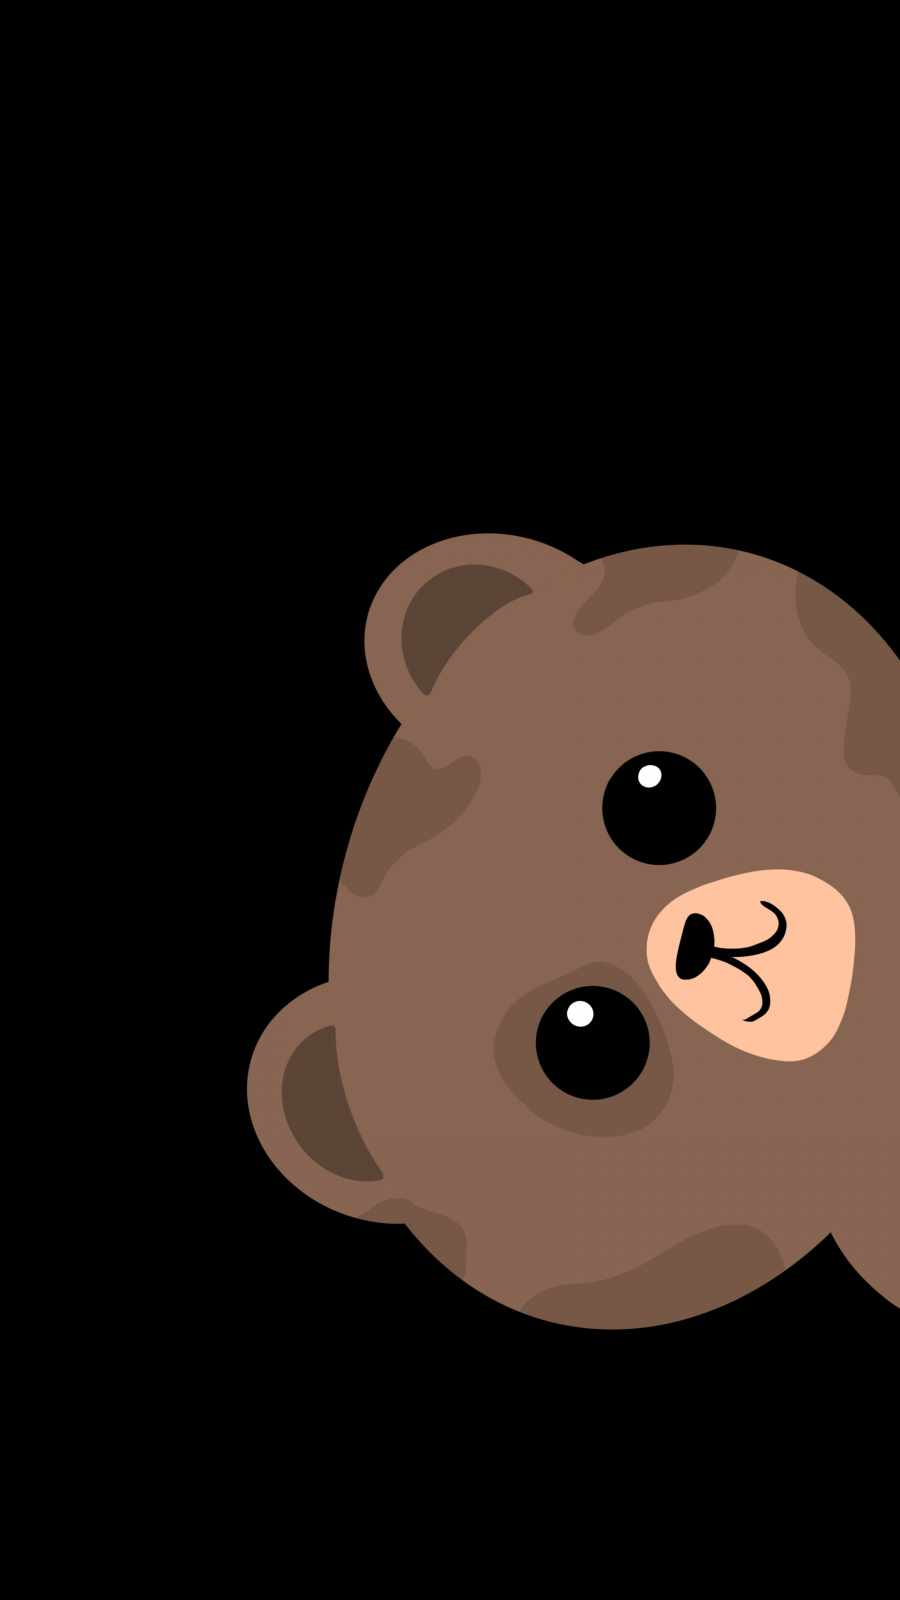 Teddy Bear iPhone Wallpaper